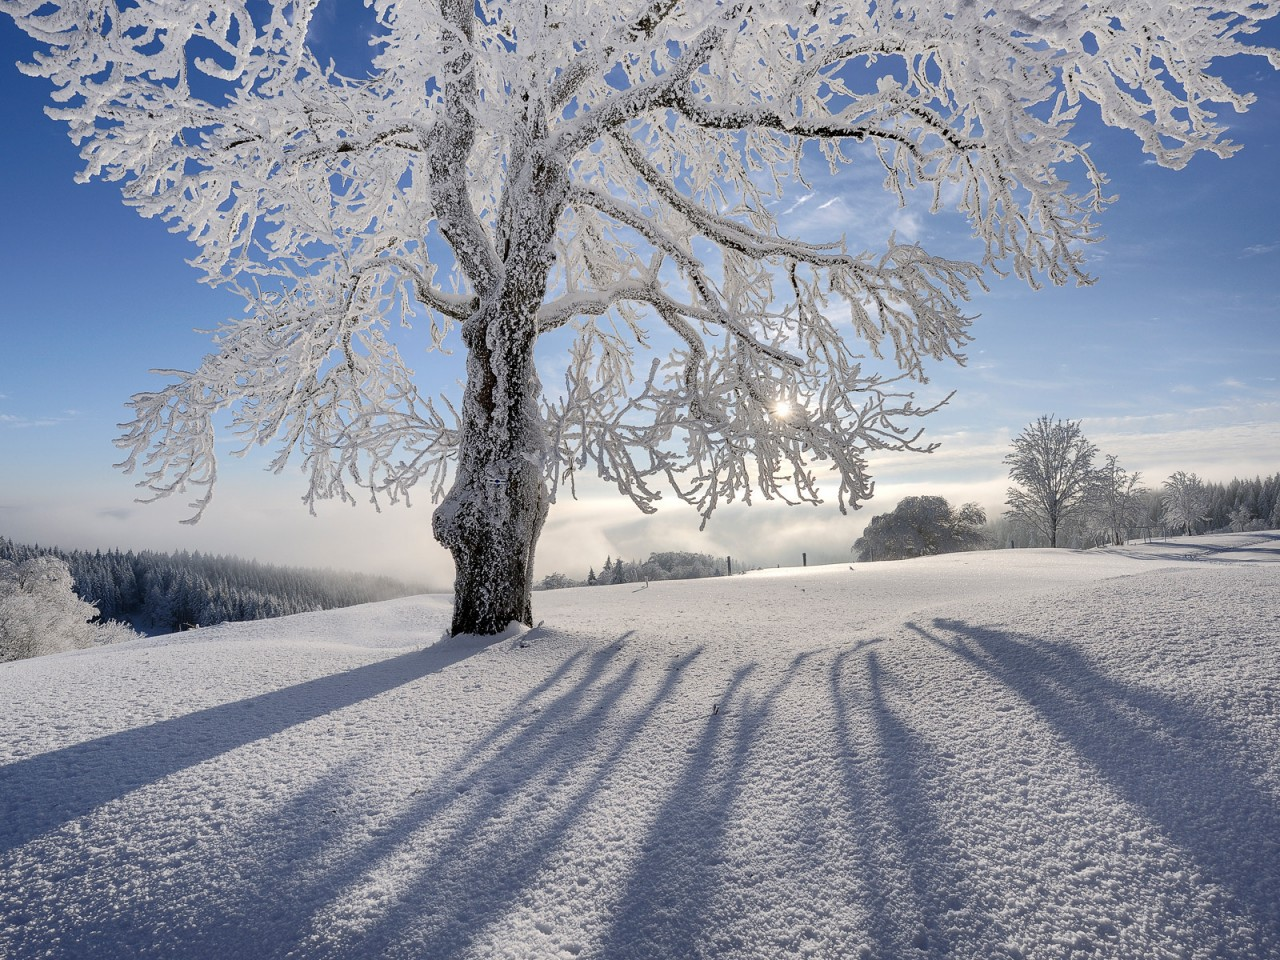 800x600 солнце, снег, дерево картинки на рабочий стол обои фото скачать